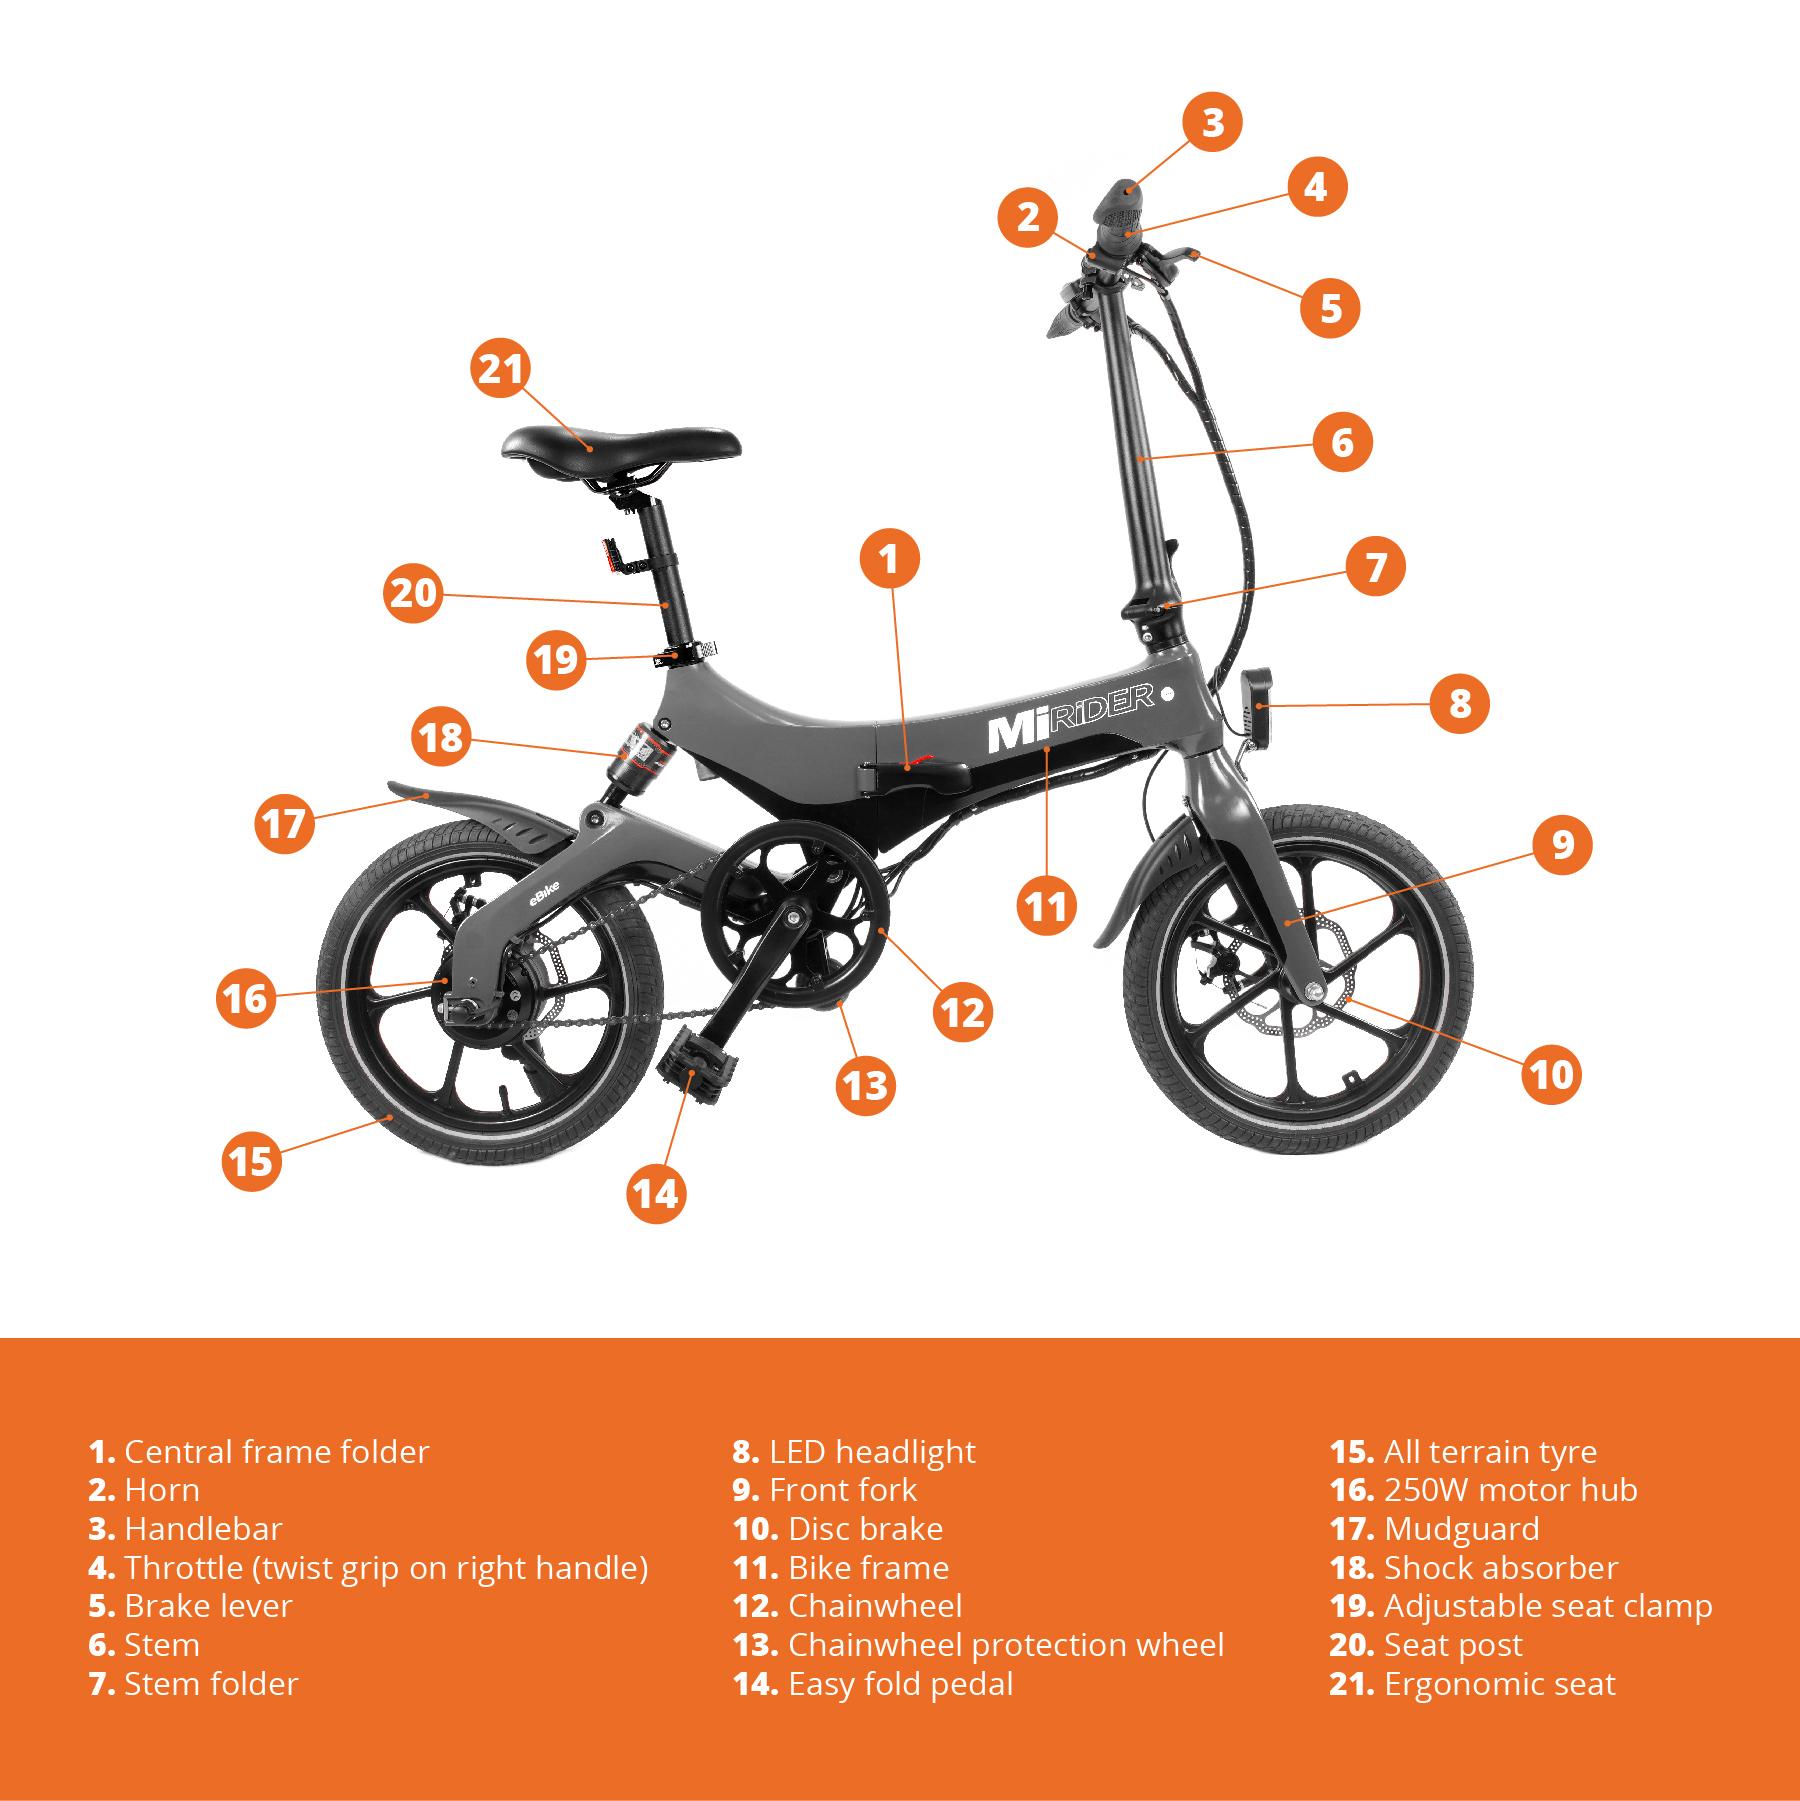 MiRiDER folding electric bike technical drawing